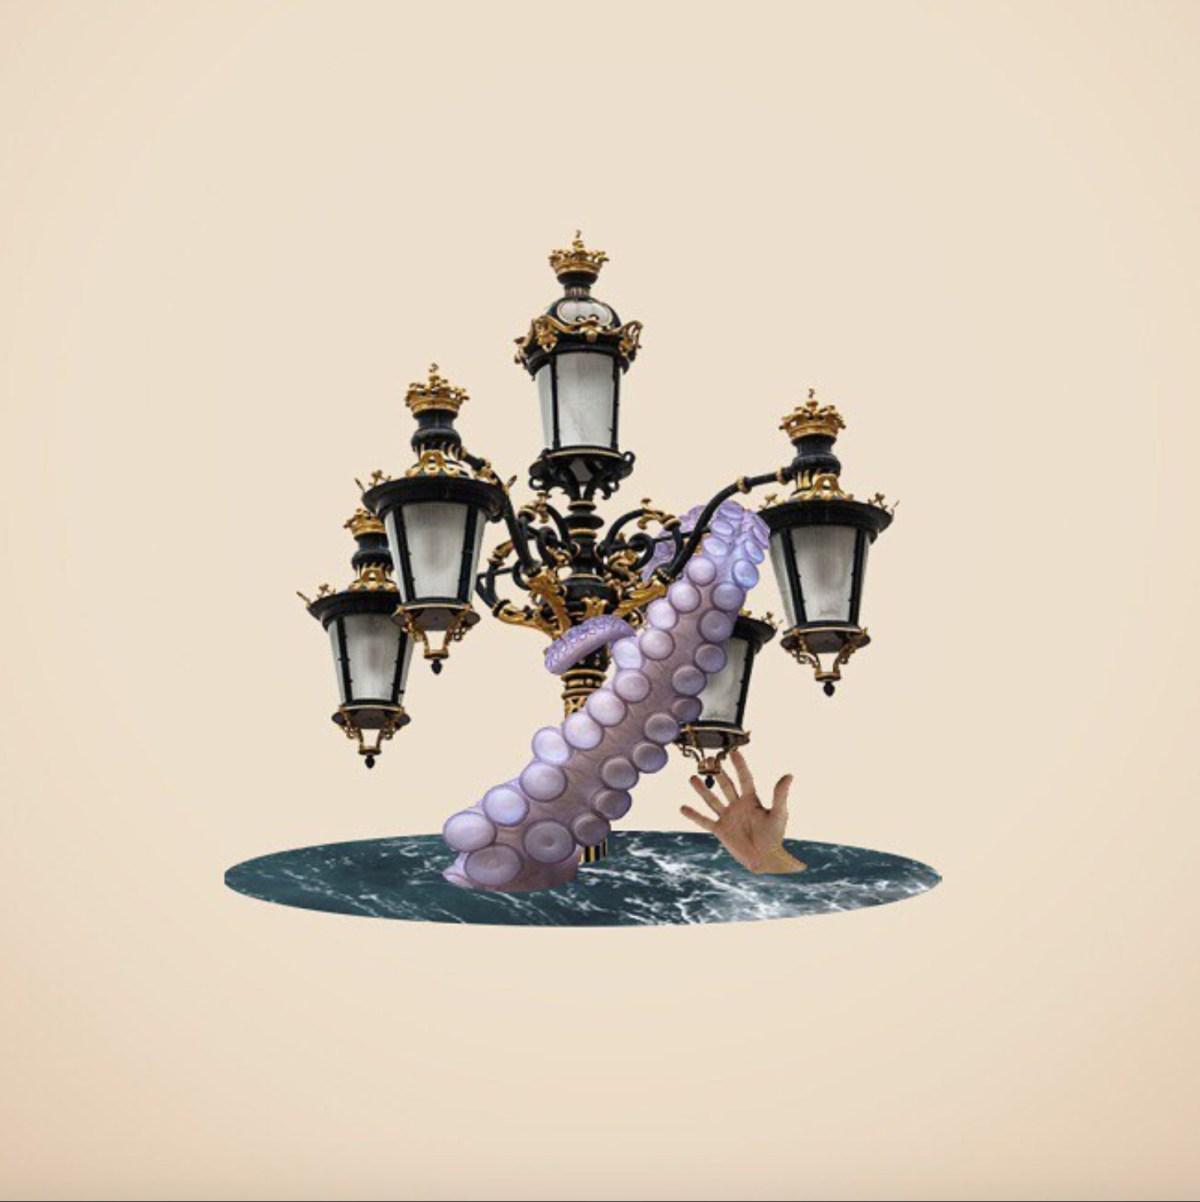 mushroomalice Instagram Collages Art